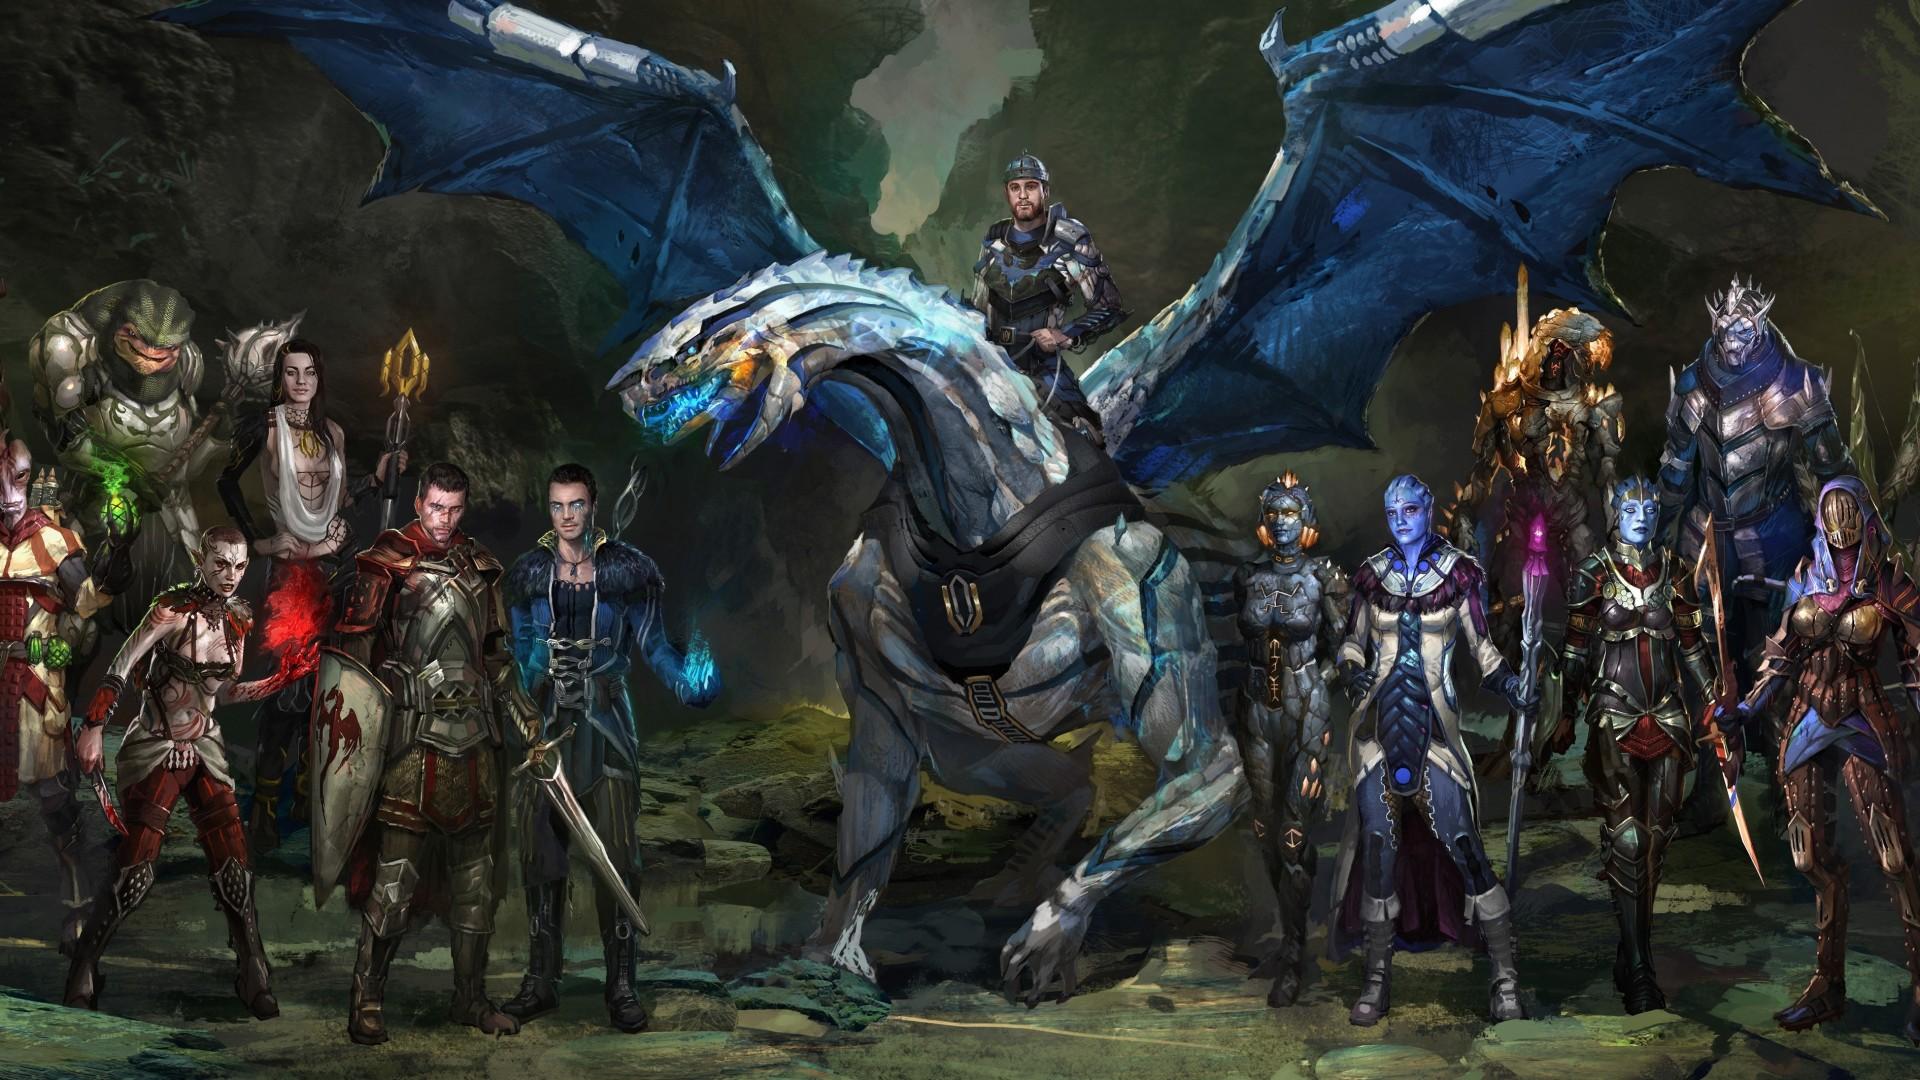 Download Wallpaper Mass Effect Dragon Age 1985257 Hd